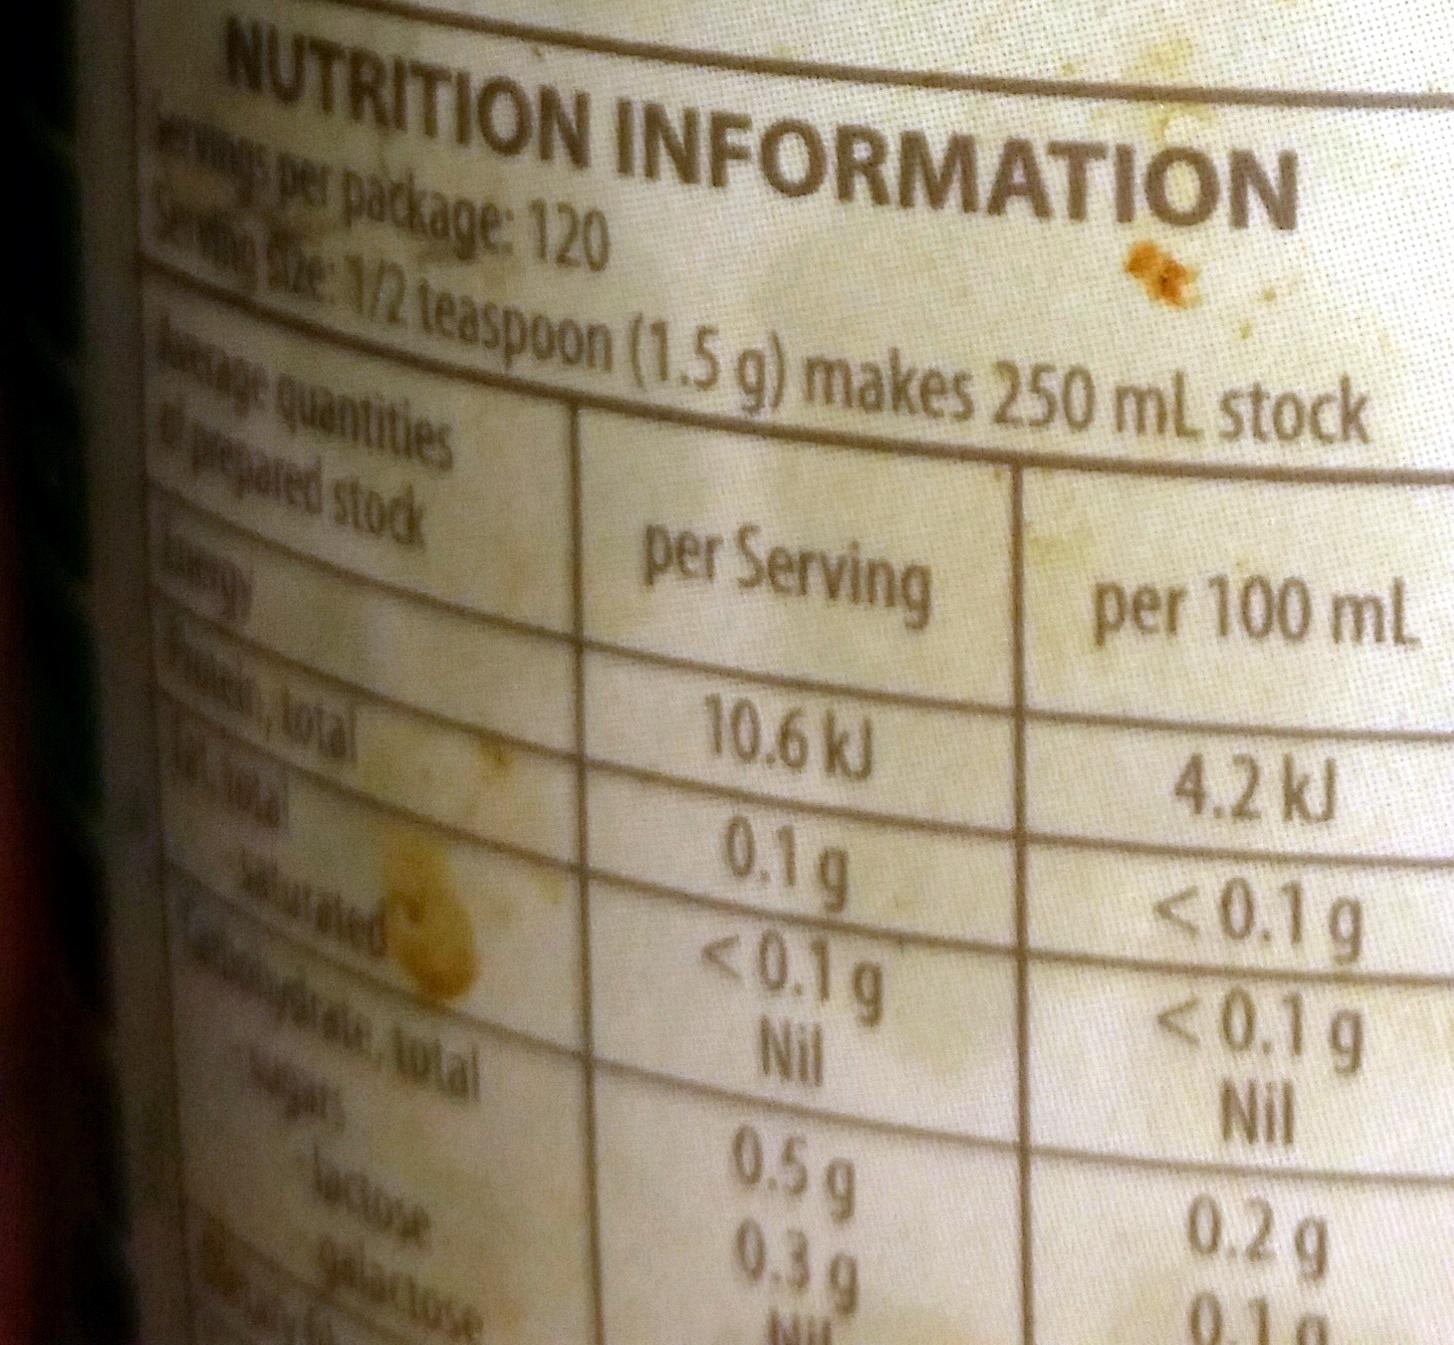 Delight vegetable stock - Nutrition facts - en